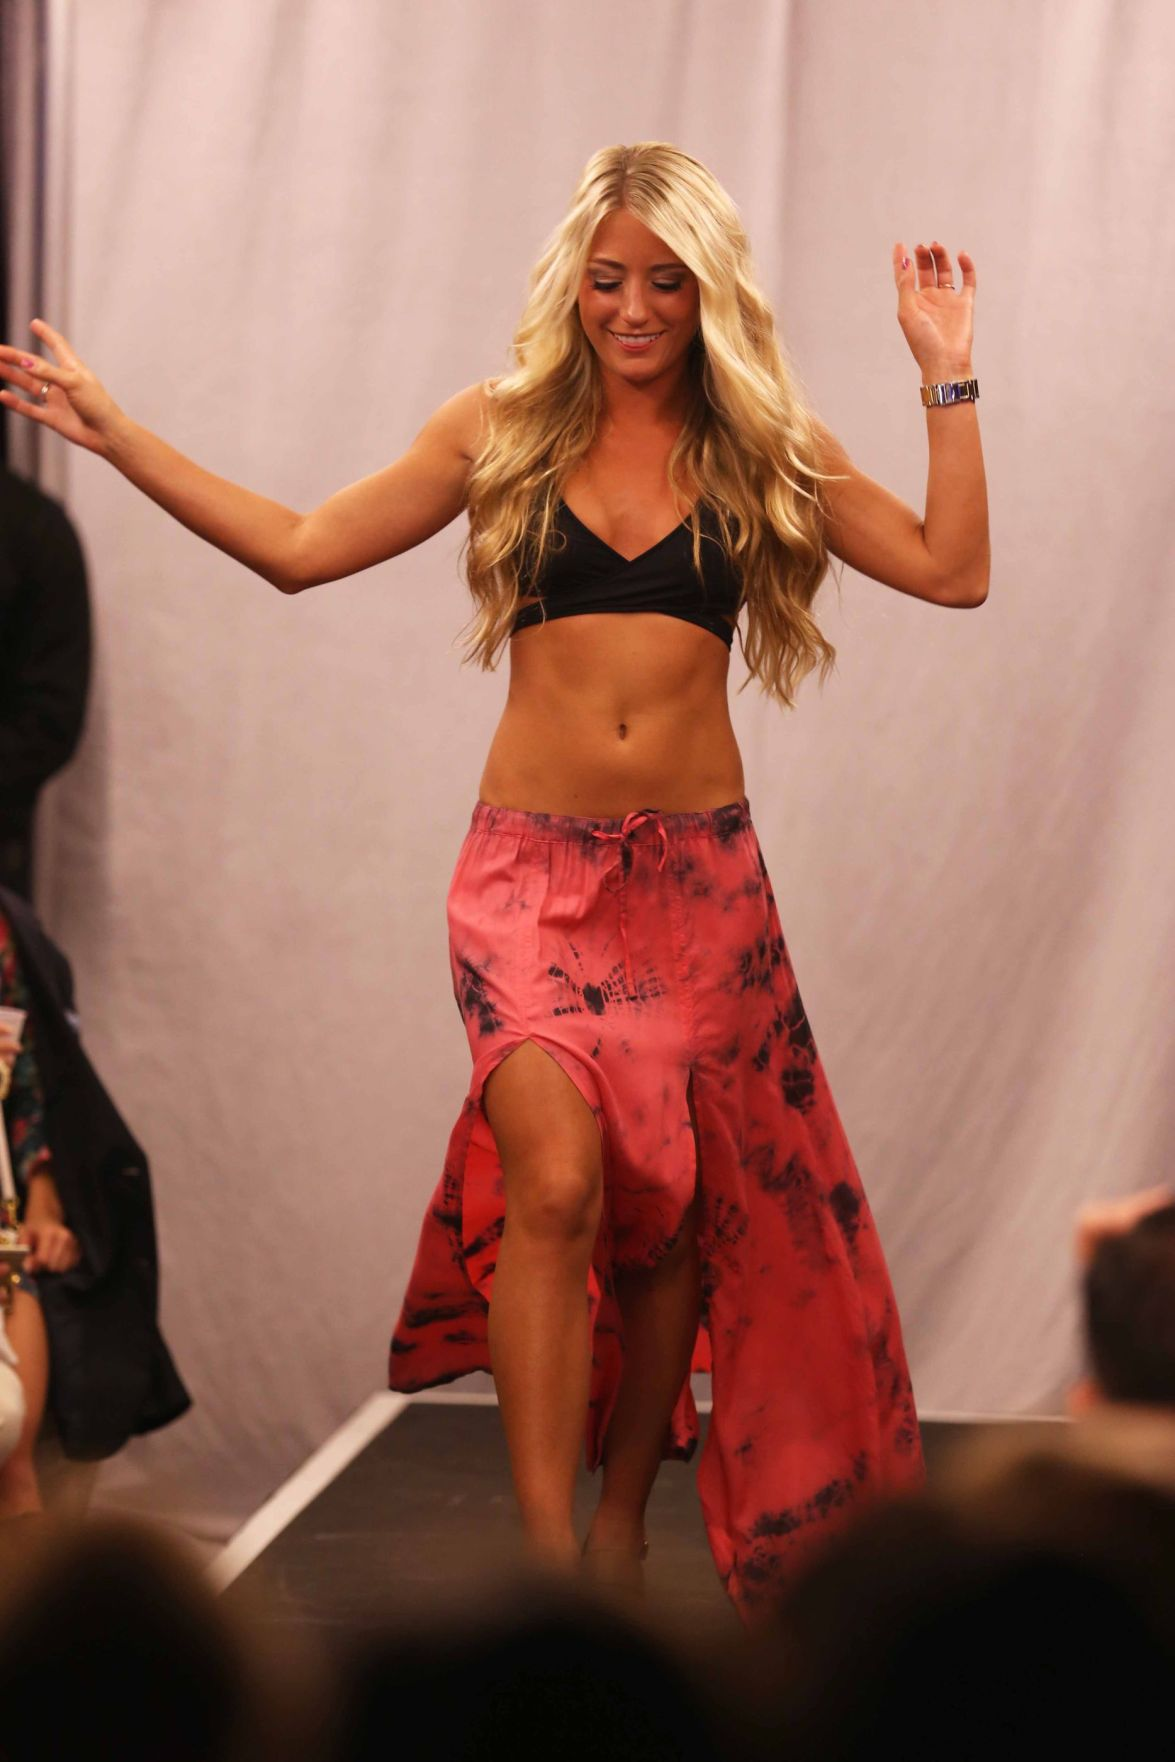 Las Olas debuts new looks with annual fashion show ahead of beach season